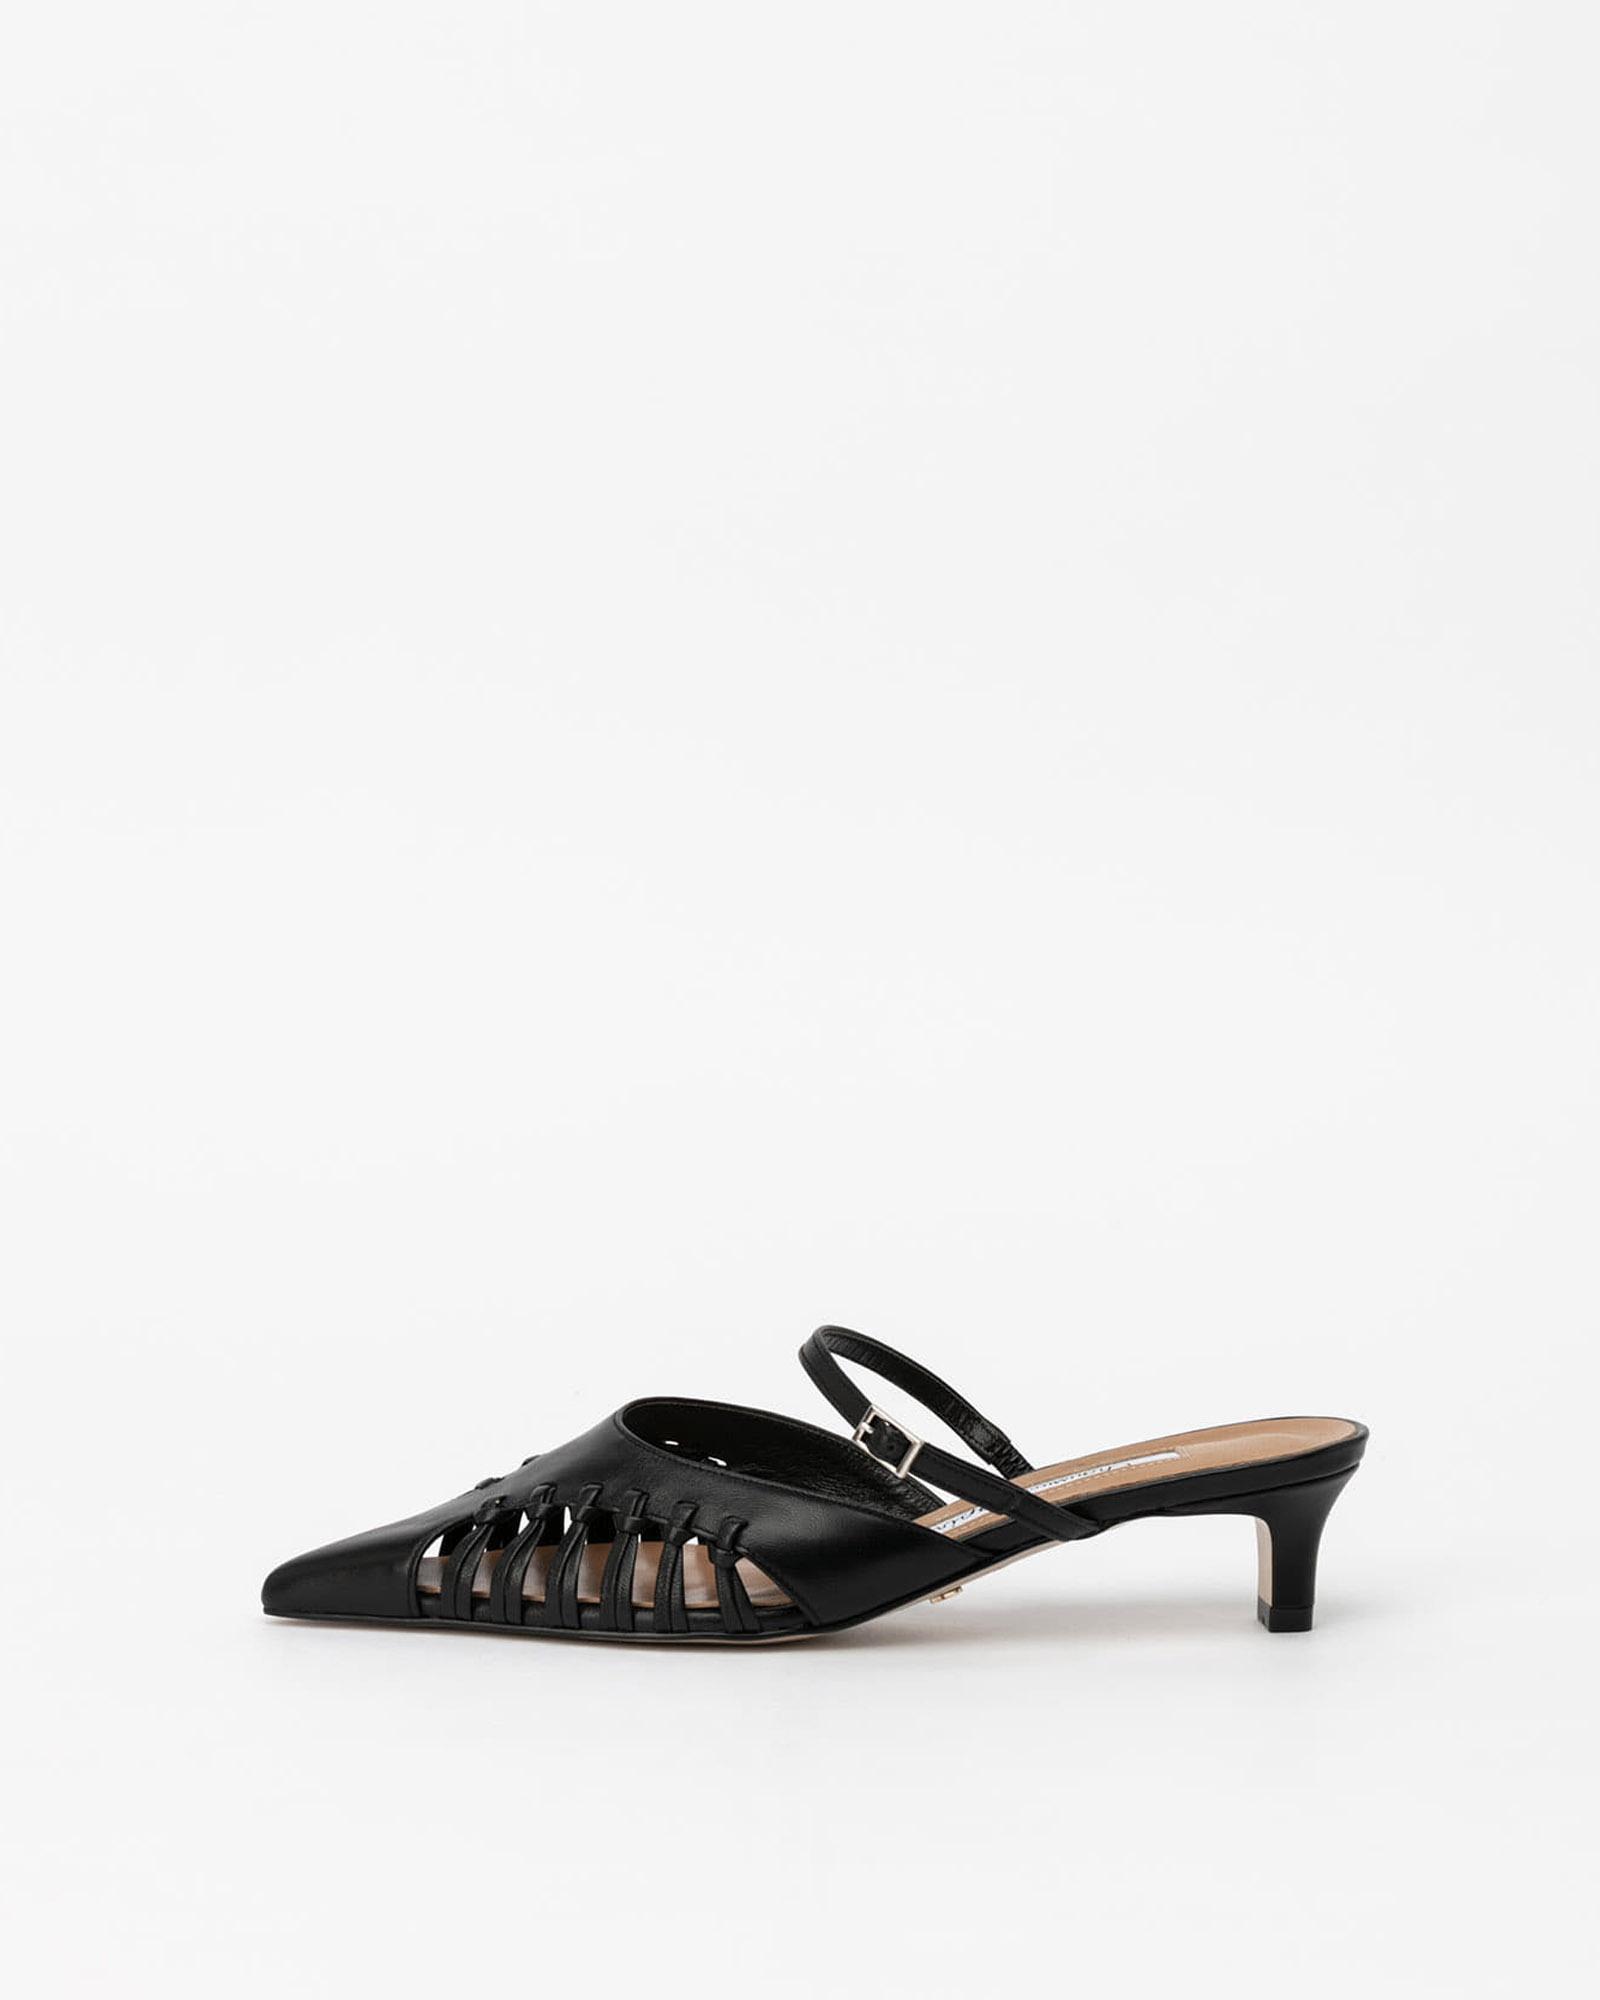 Pinceaux Mules in Black